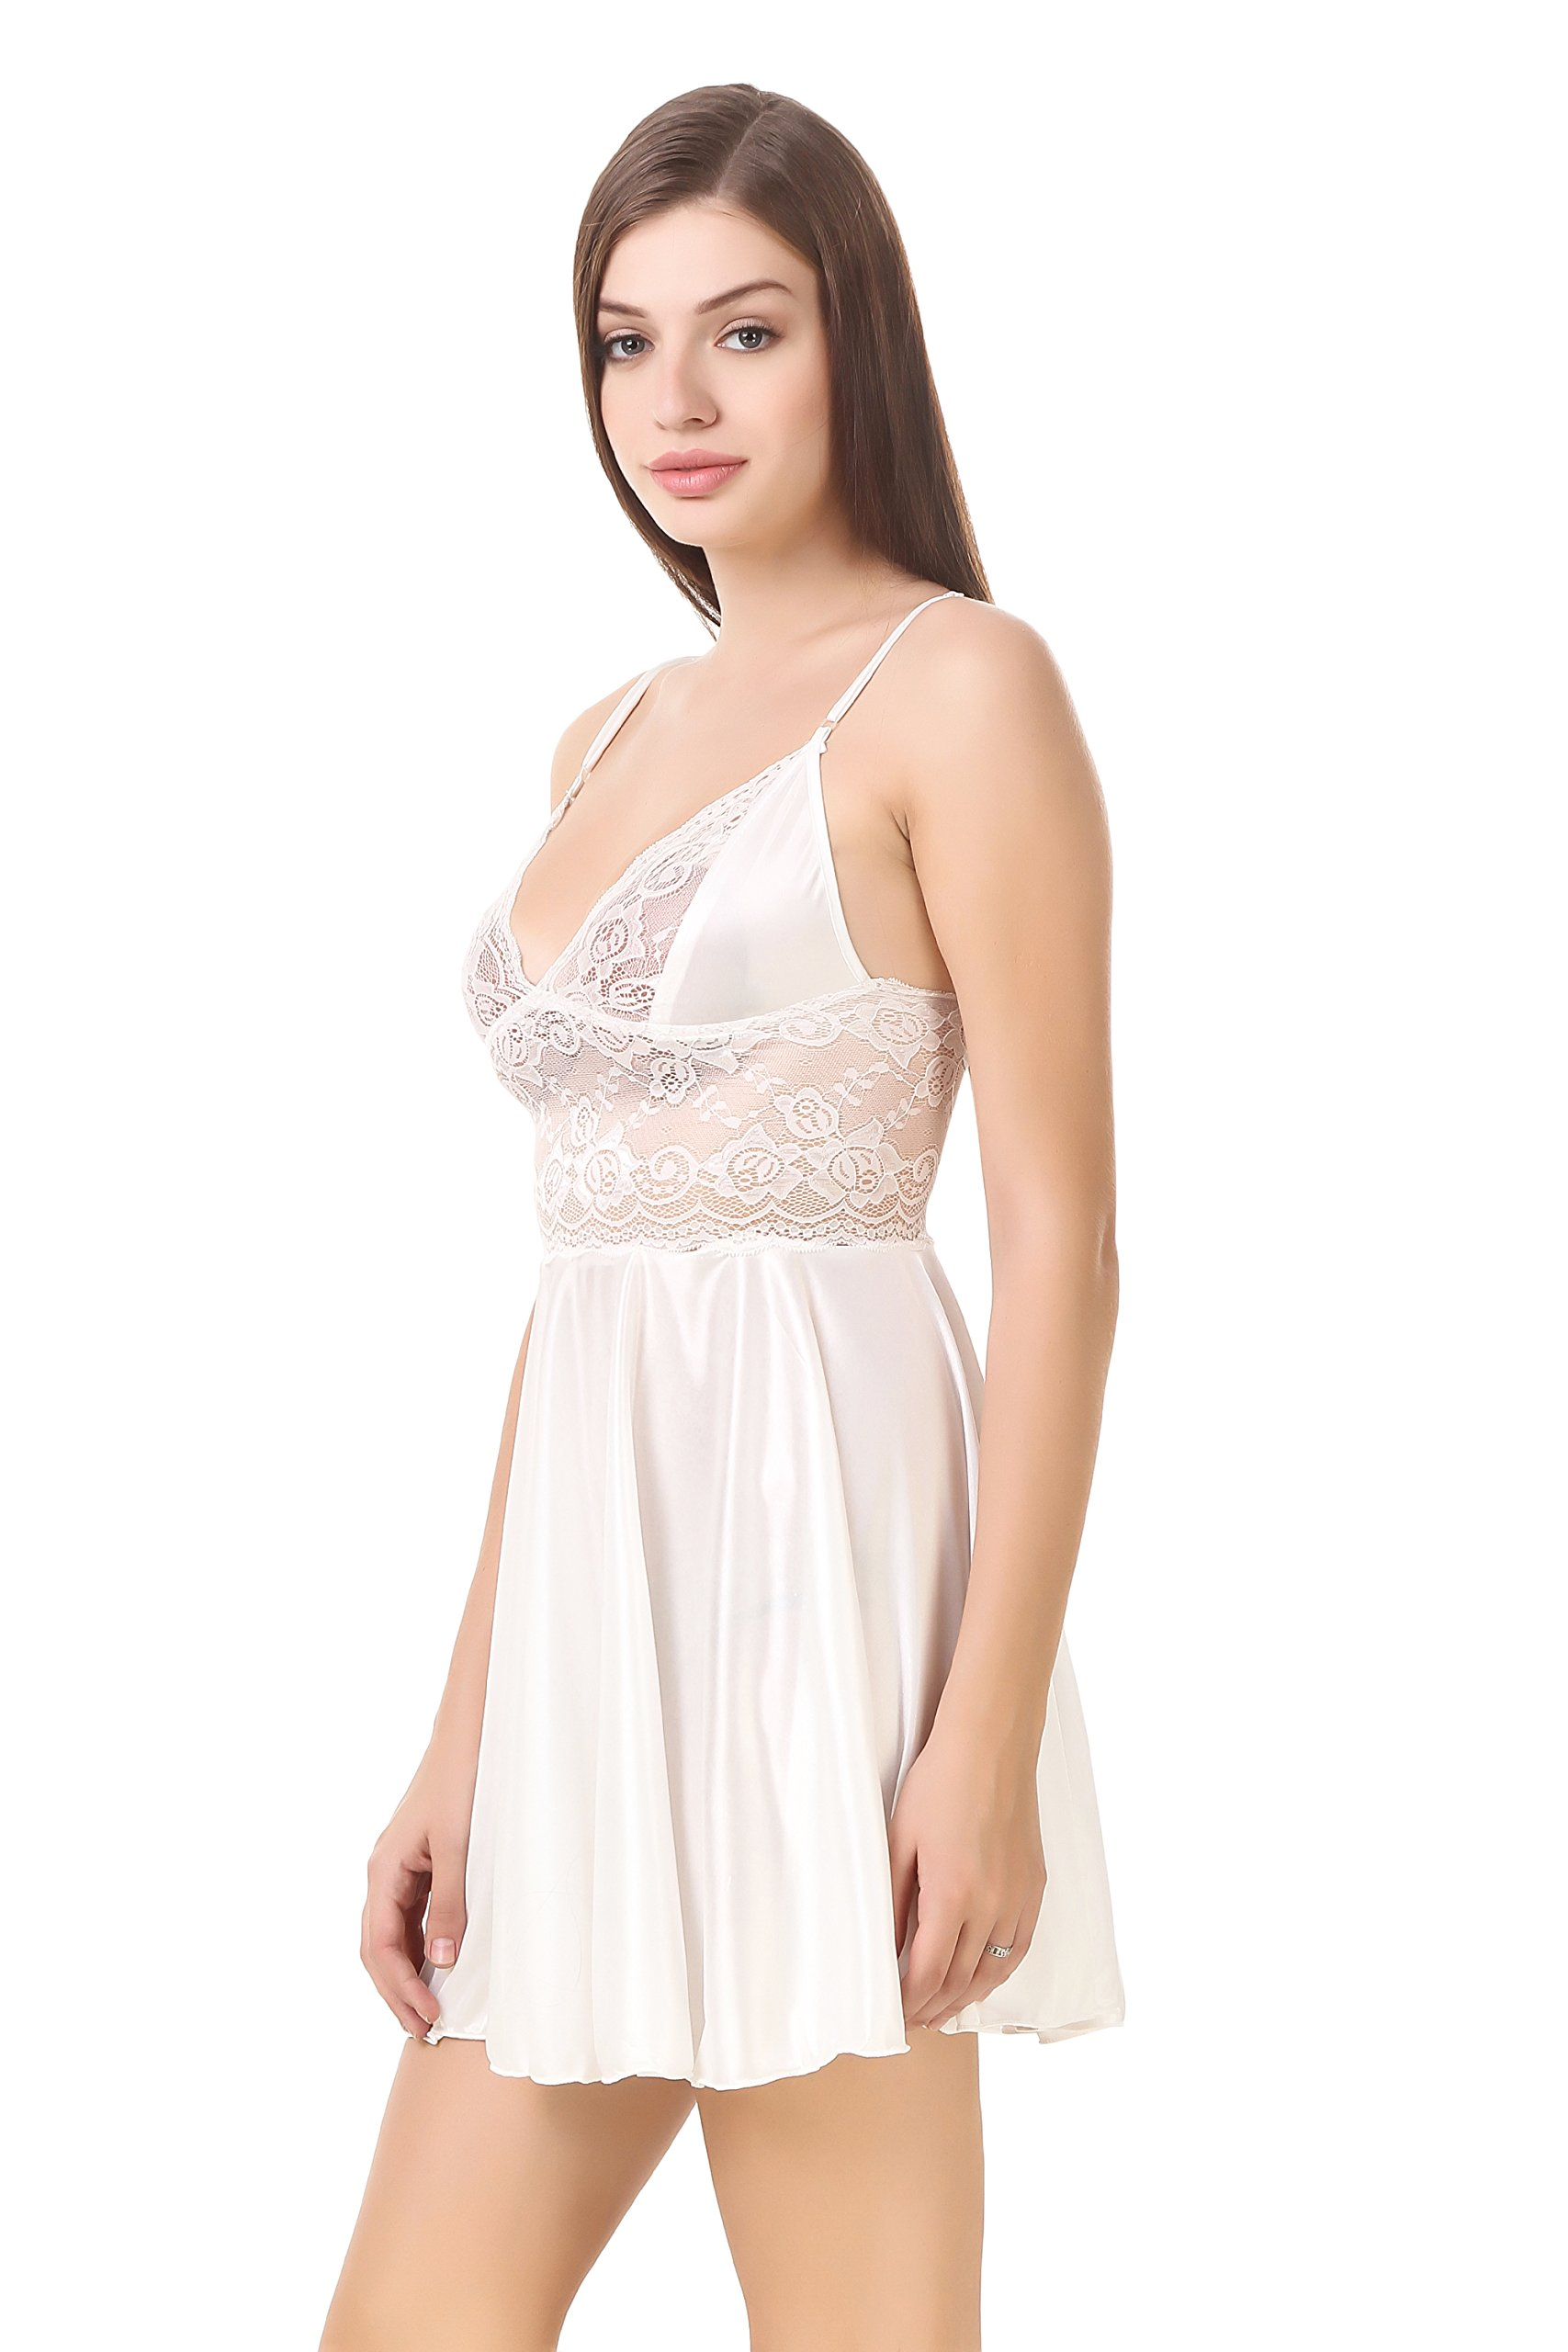 508b4f869 PHWOAR Women Satin Babydoll Night Dress Short Length Free Size